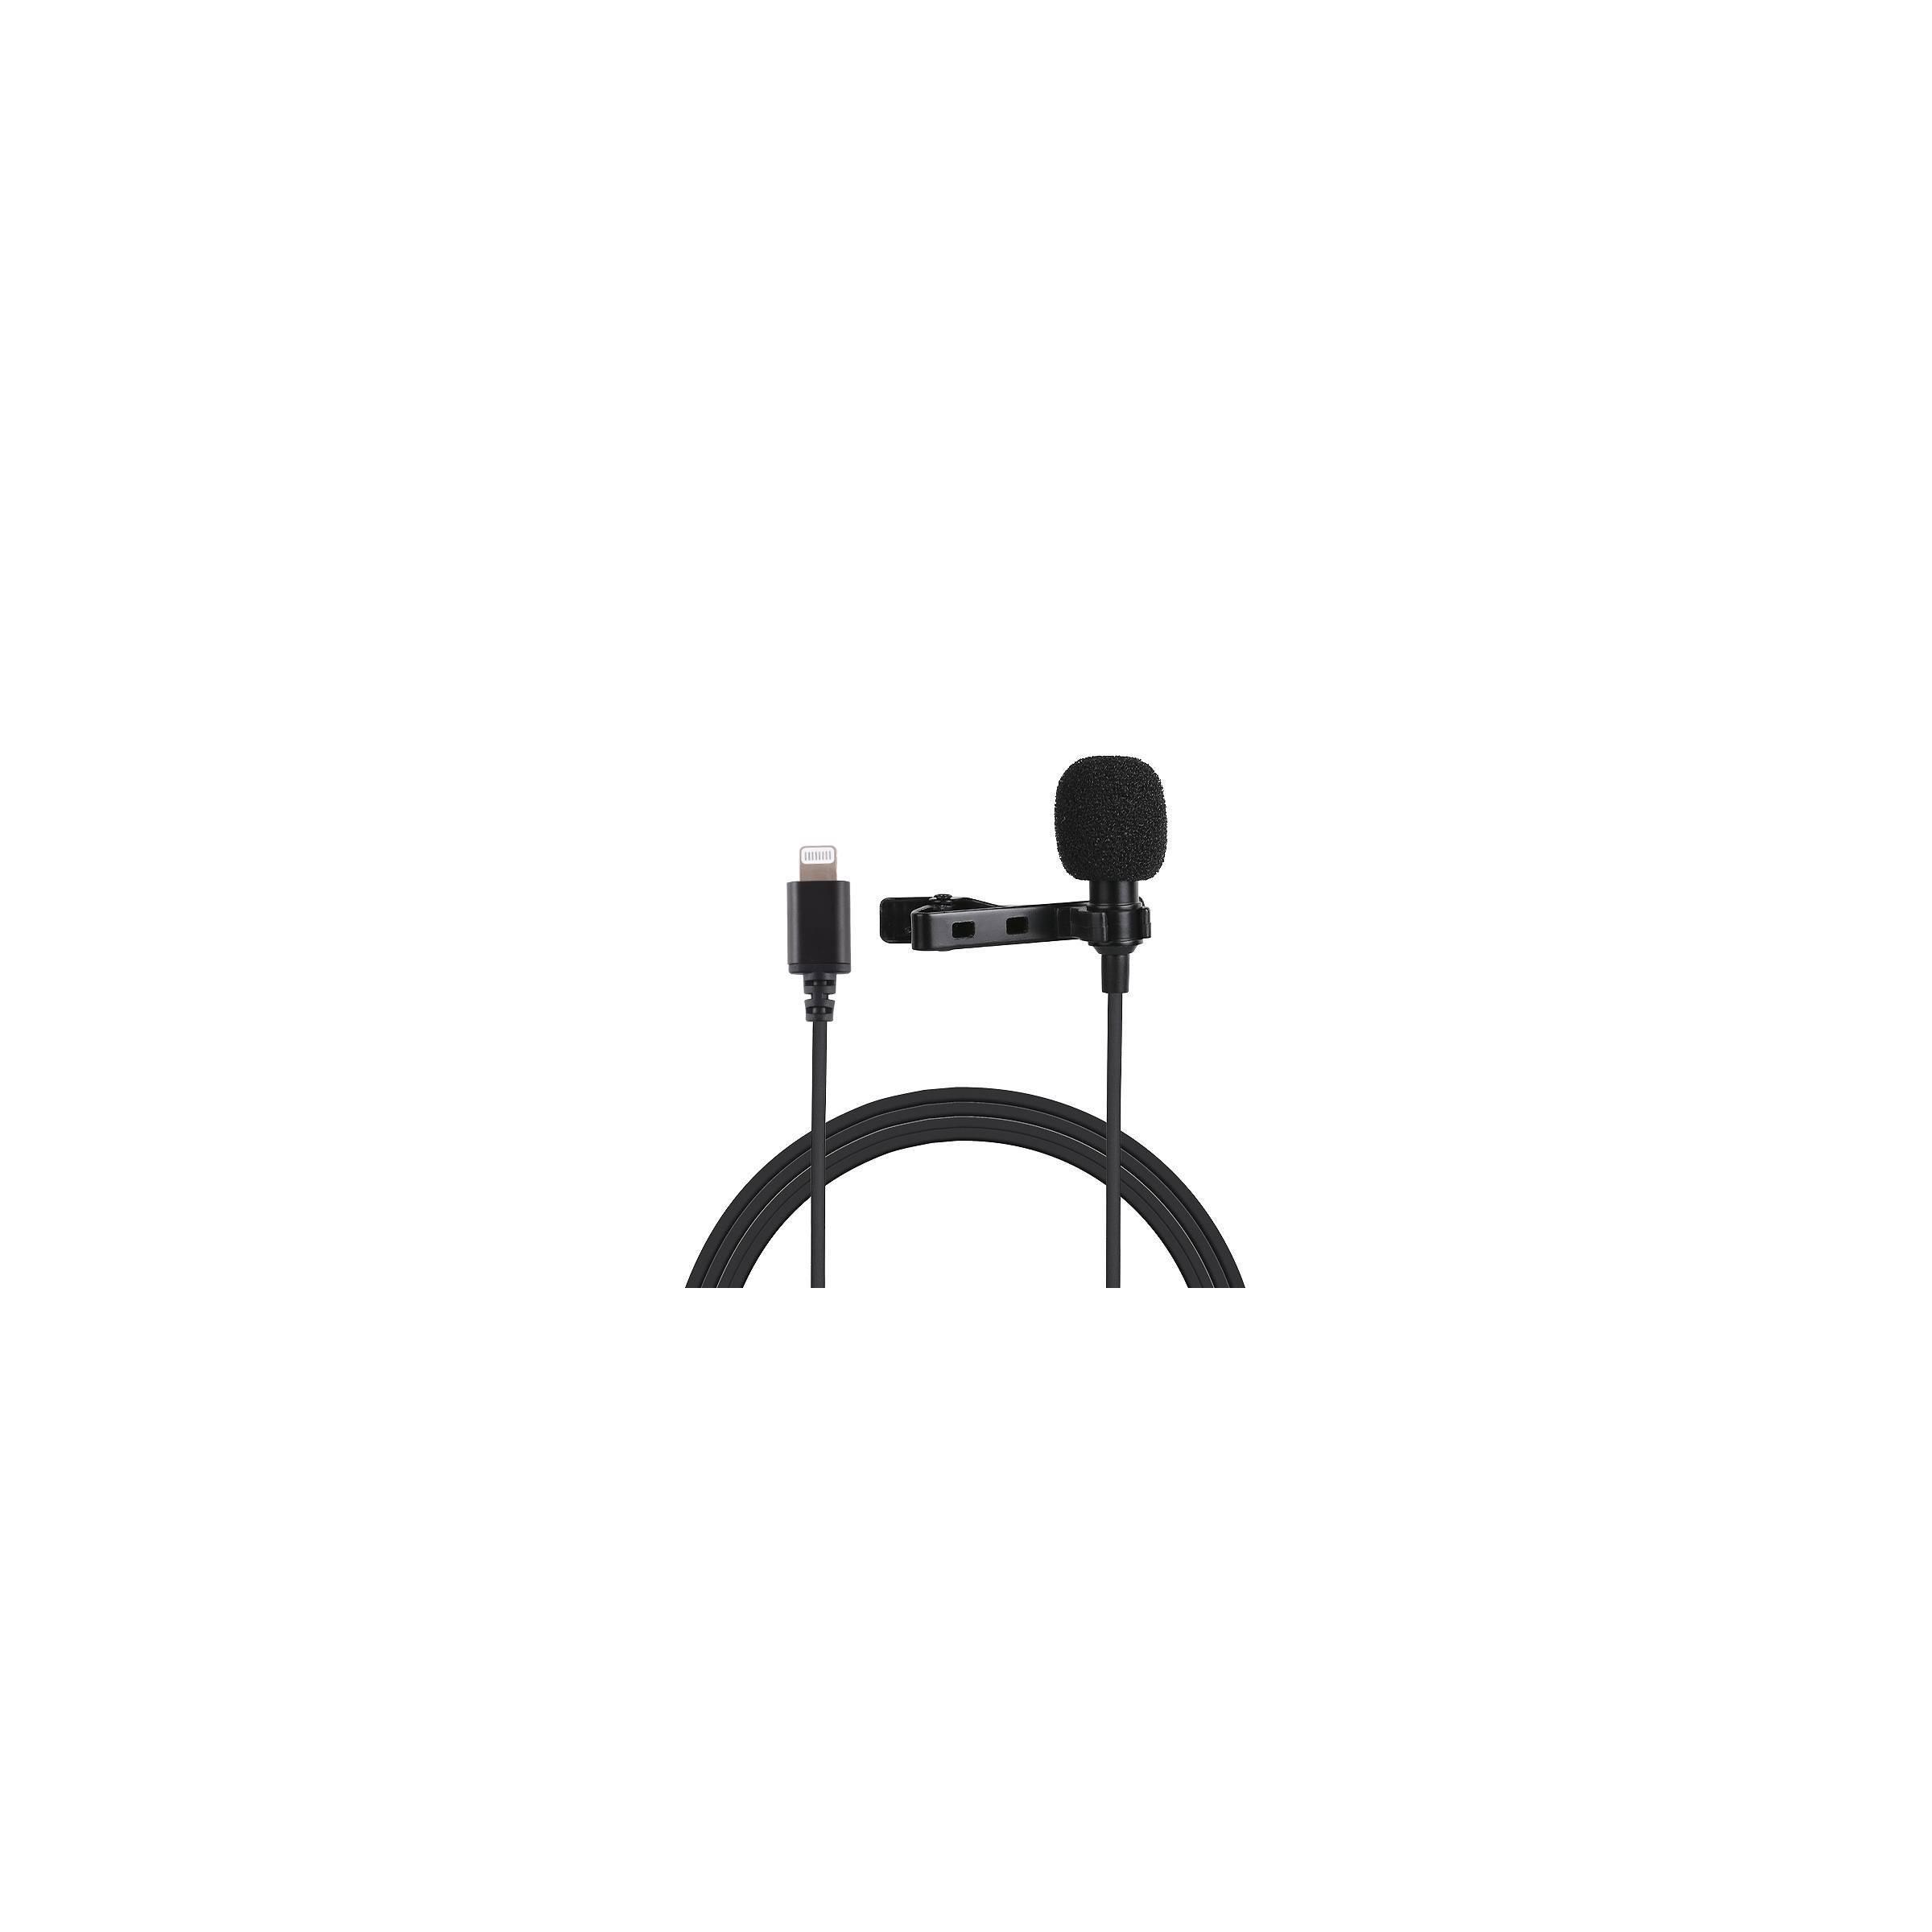 puluz – Mikrofon clip on til iphone & ipad med lightning fra mackabler.dk